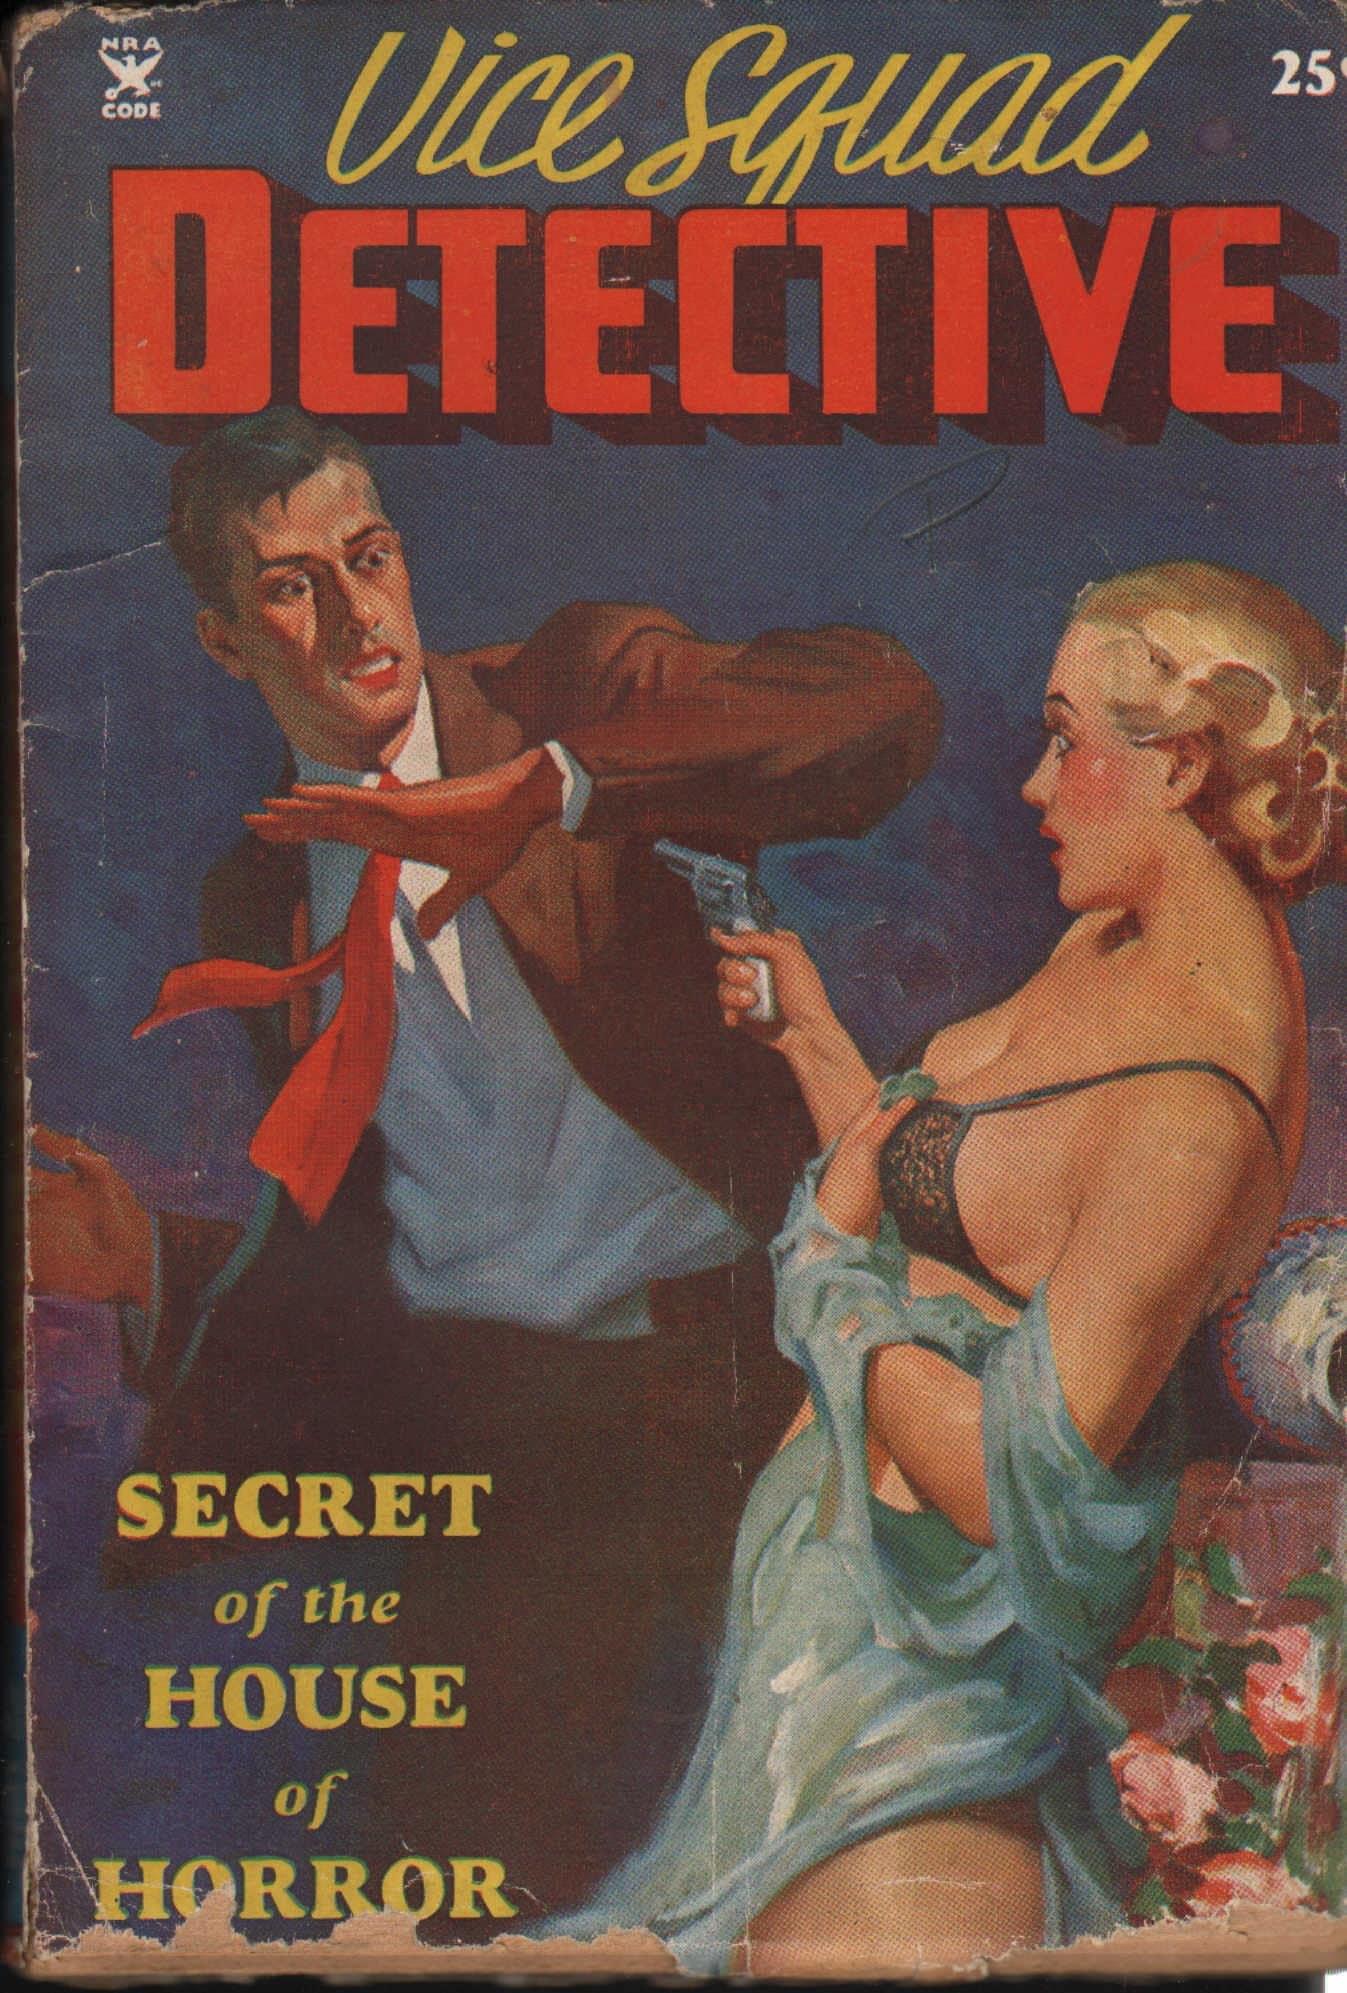 Vice Squad Detective